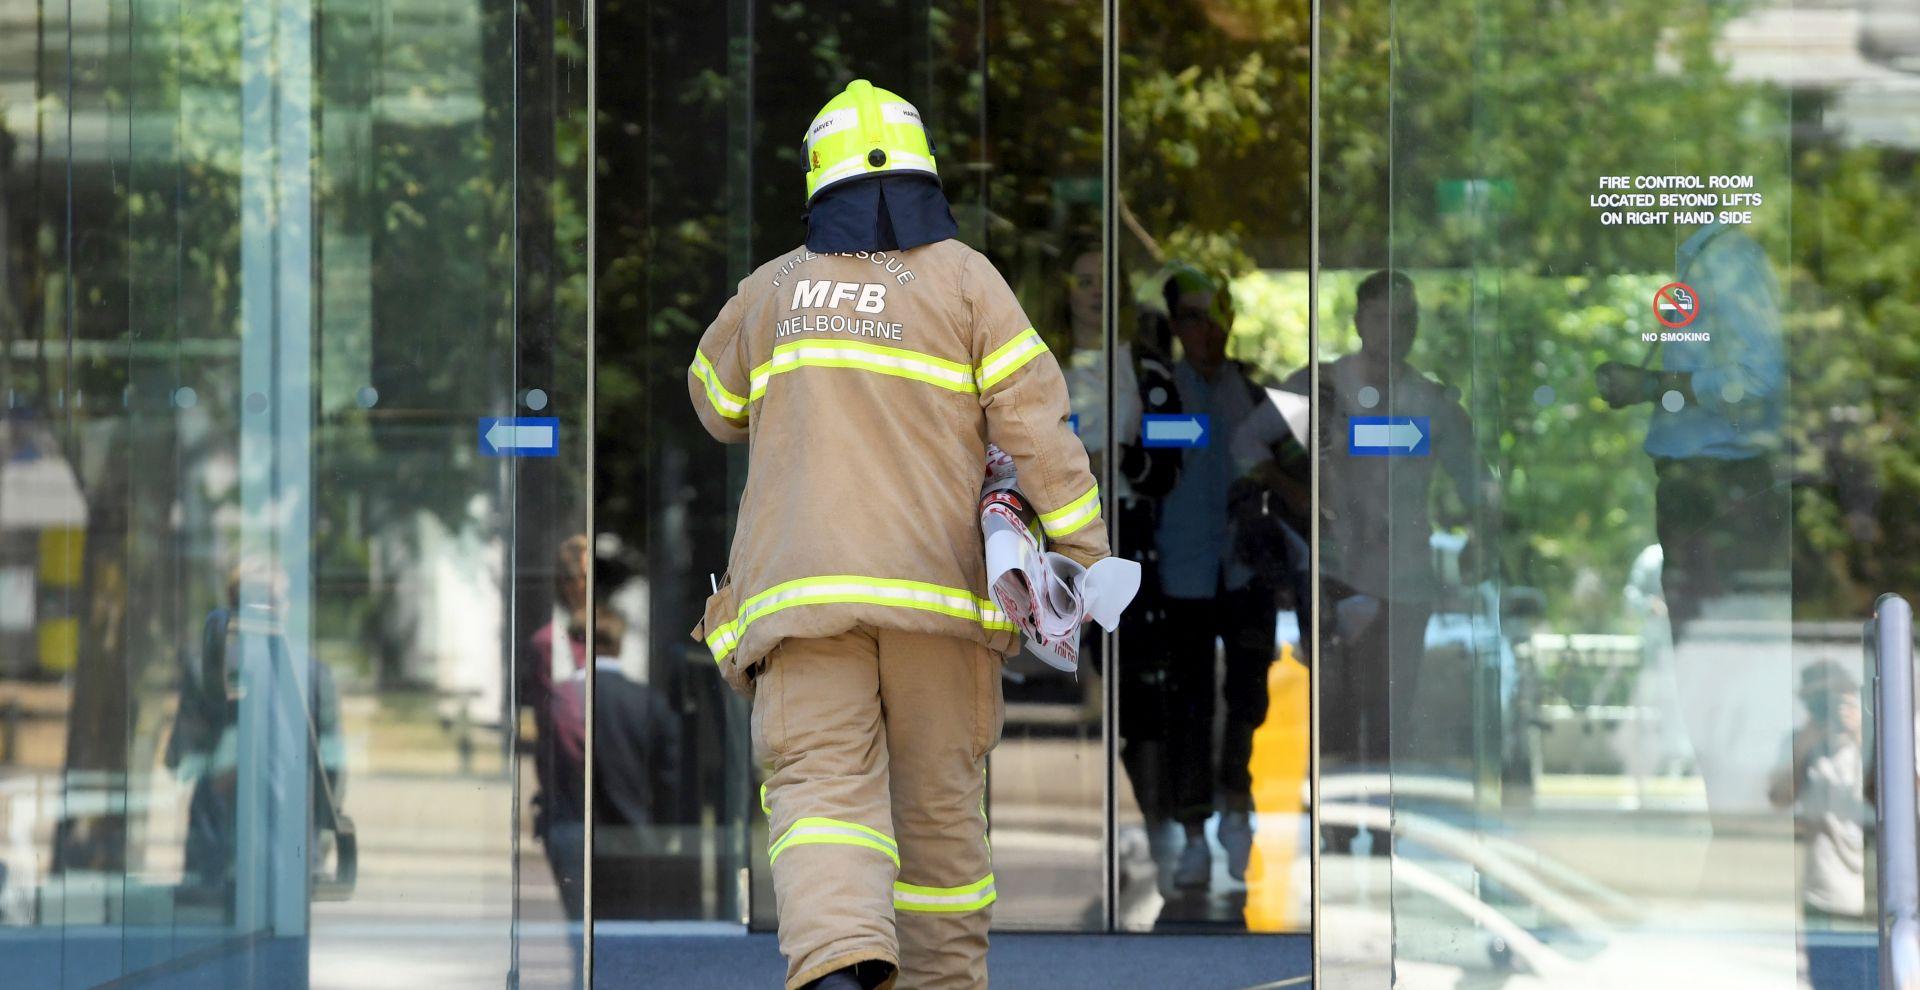 Australska policija uhitila muškarca osumnjičenog za slanje sumnjivih paketa